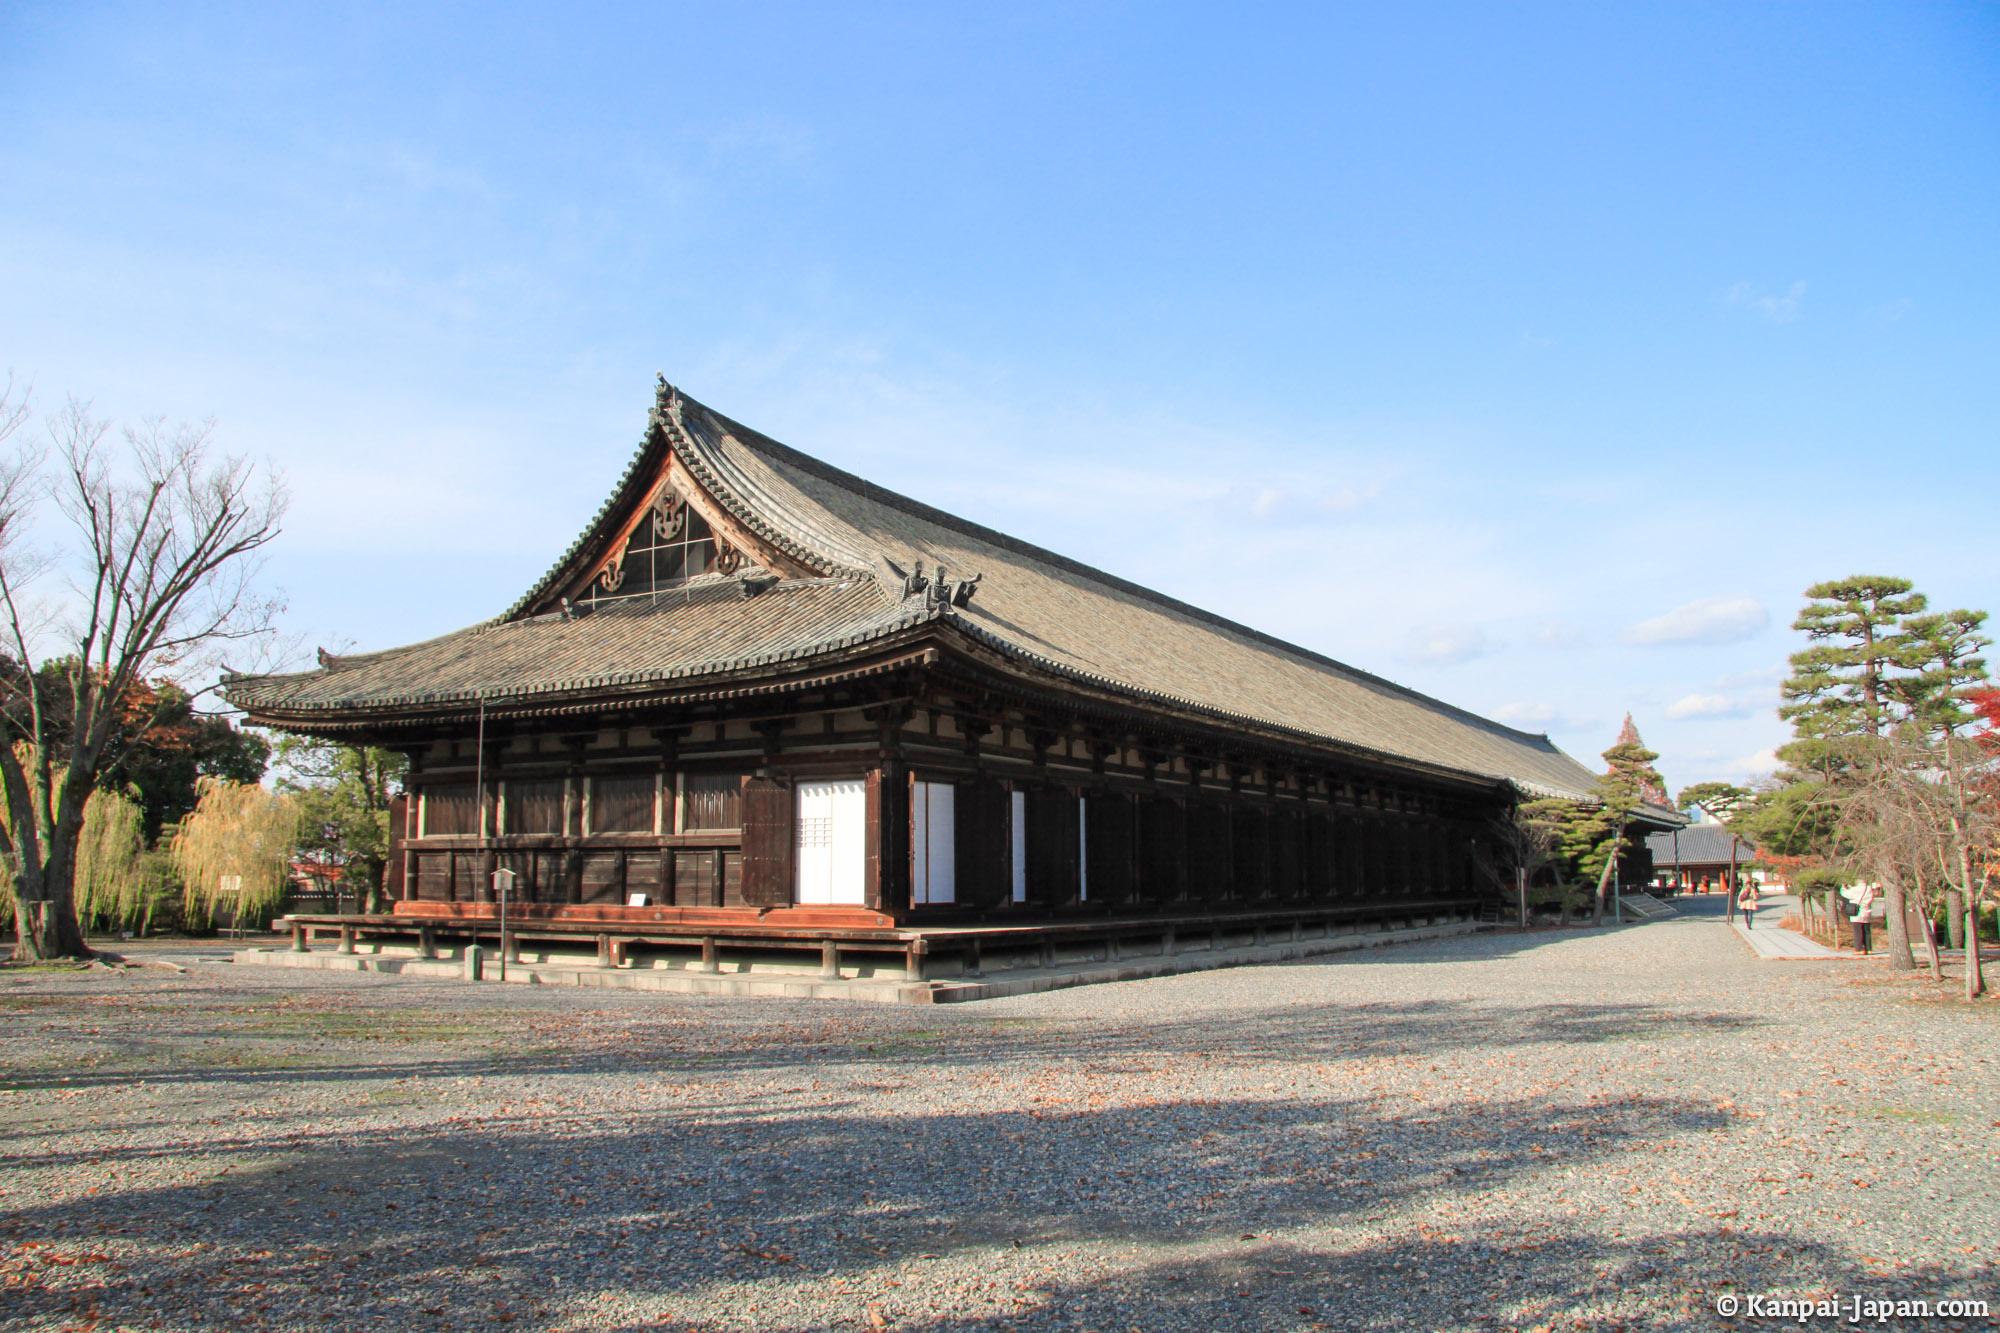 Sanjusangendo - The 1001 Buddhist statues temple in Kyoto